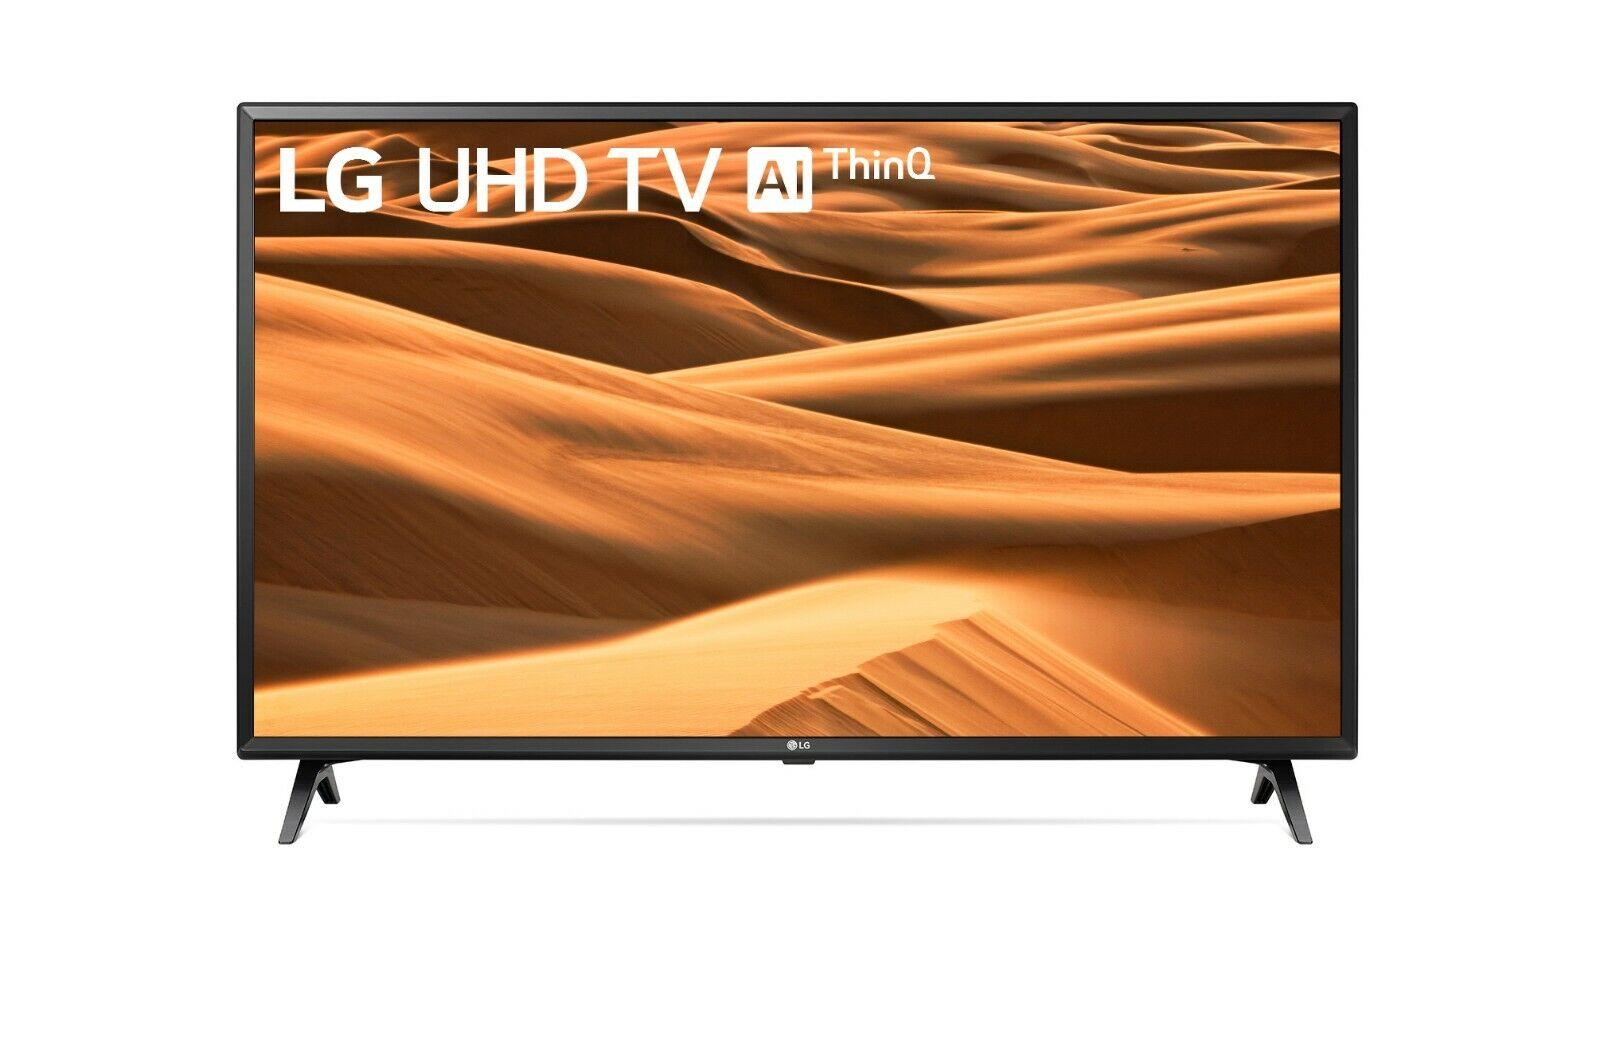 "LG Smart TV 43"" LED IPS Ultra HD 4K web OS 4.5 New 43UM7340"